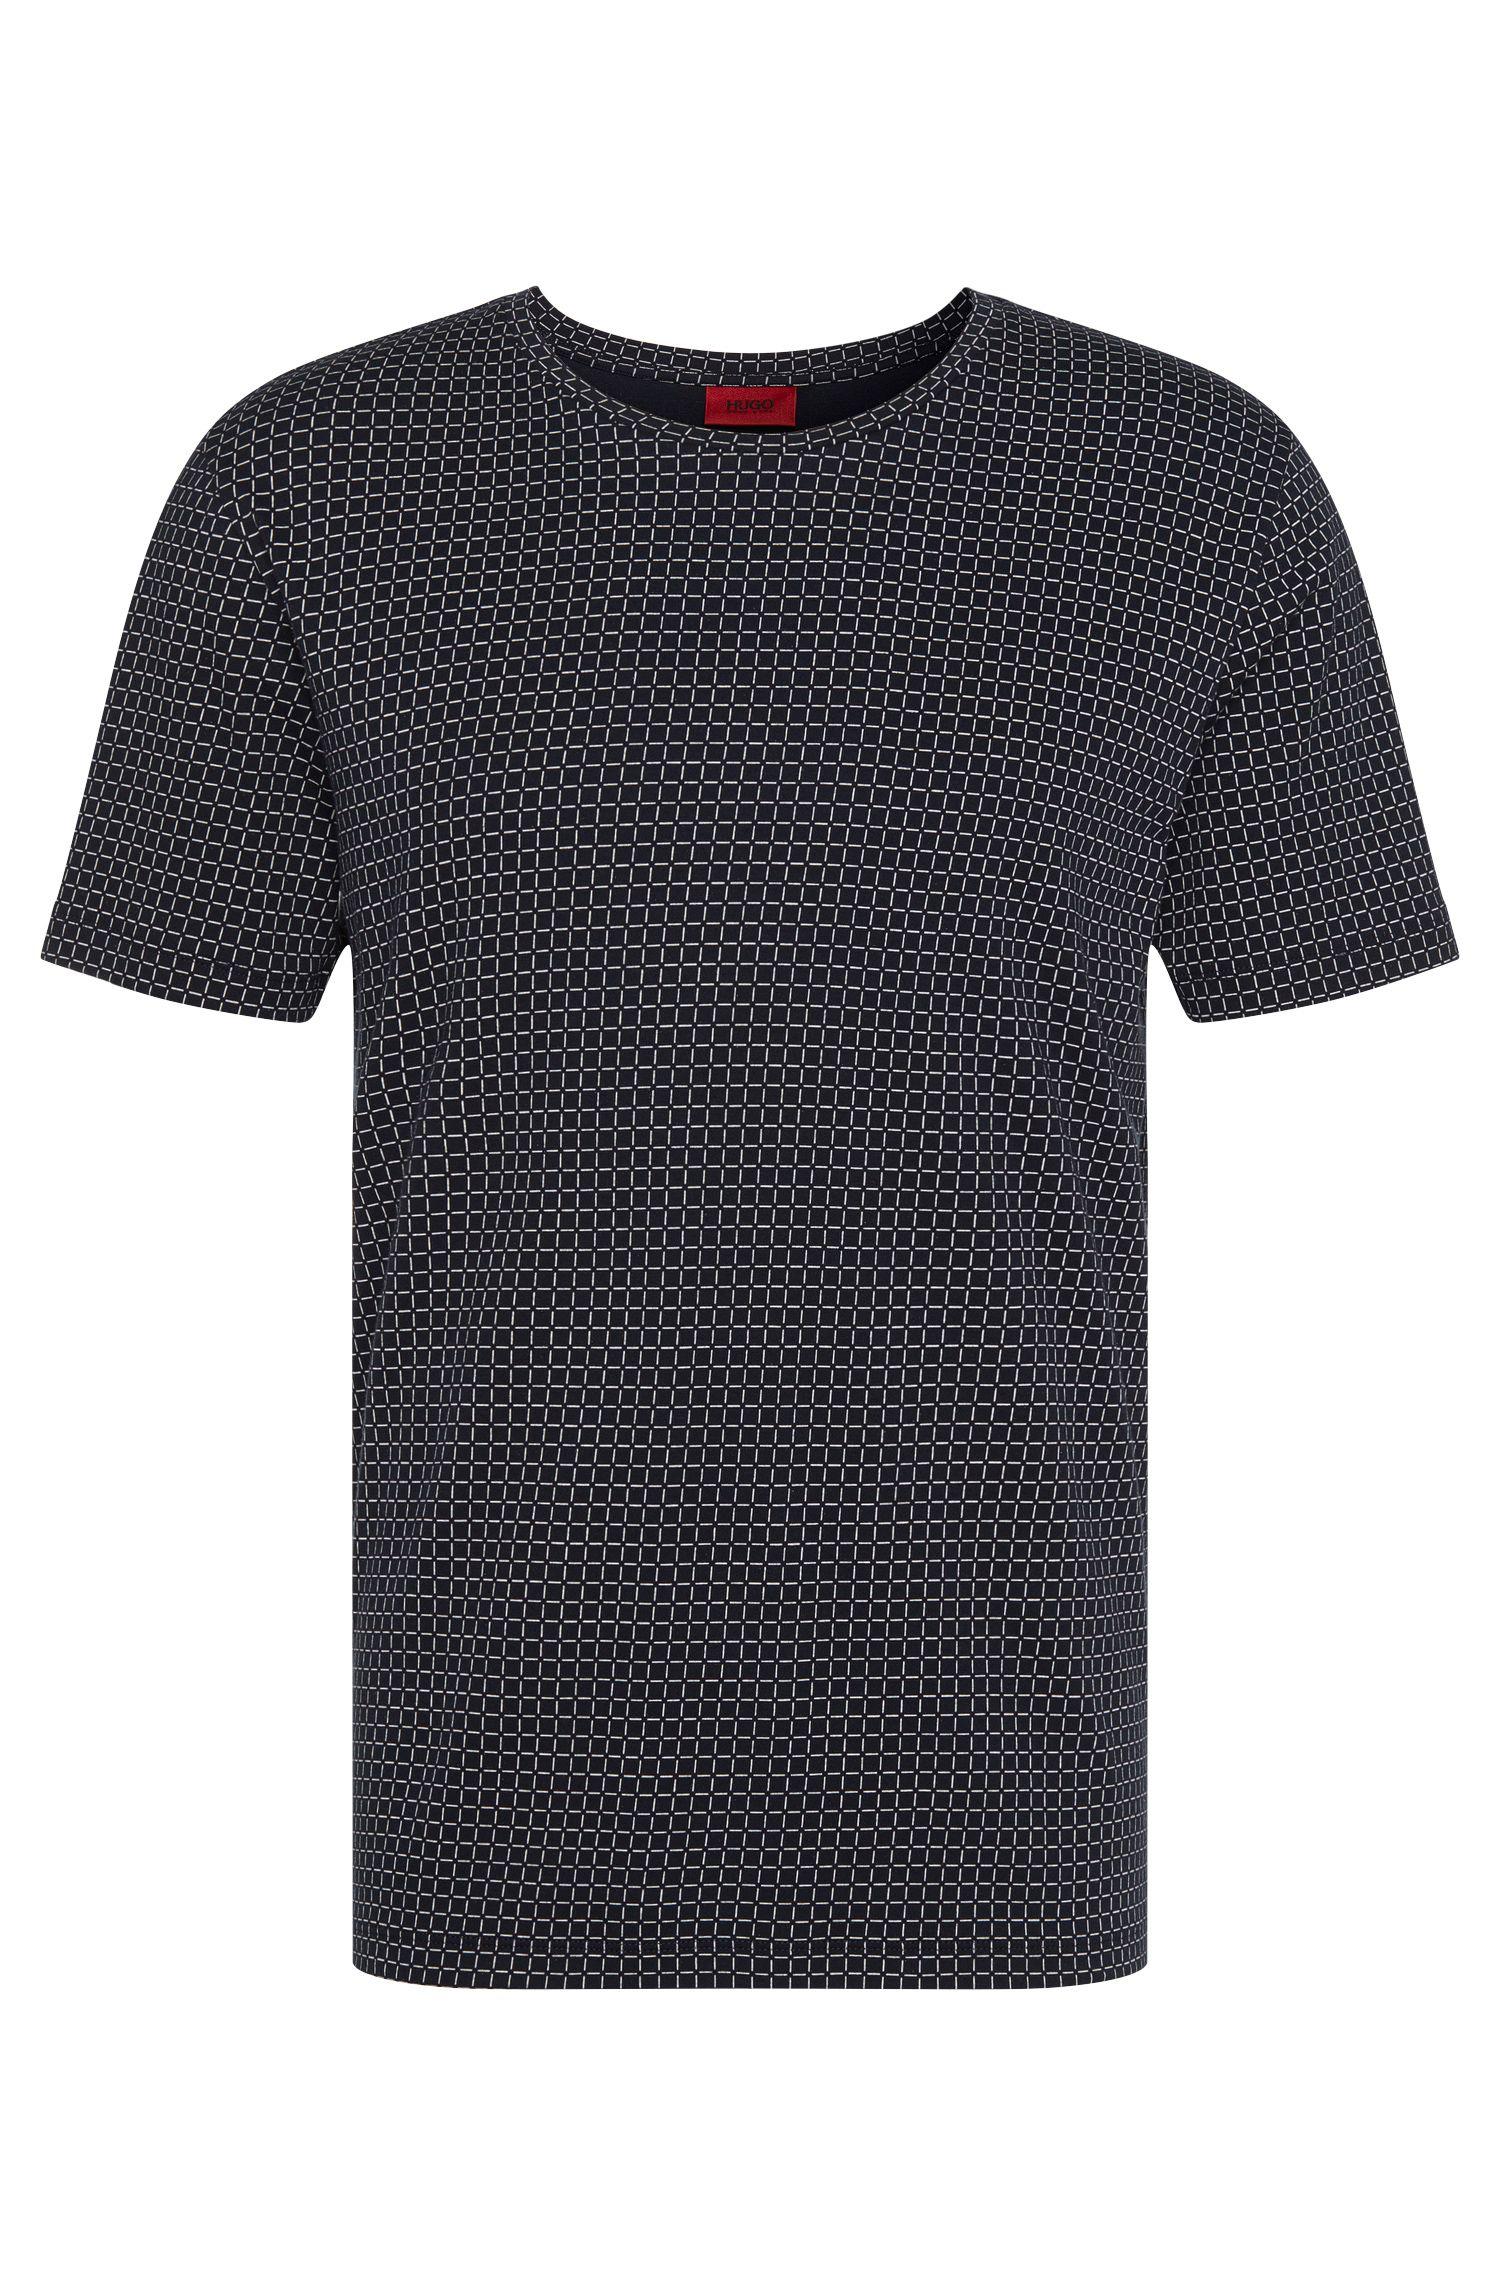 Camiseta relaxed fit estampada en algodón: 'Drid'